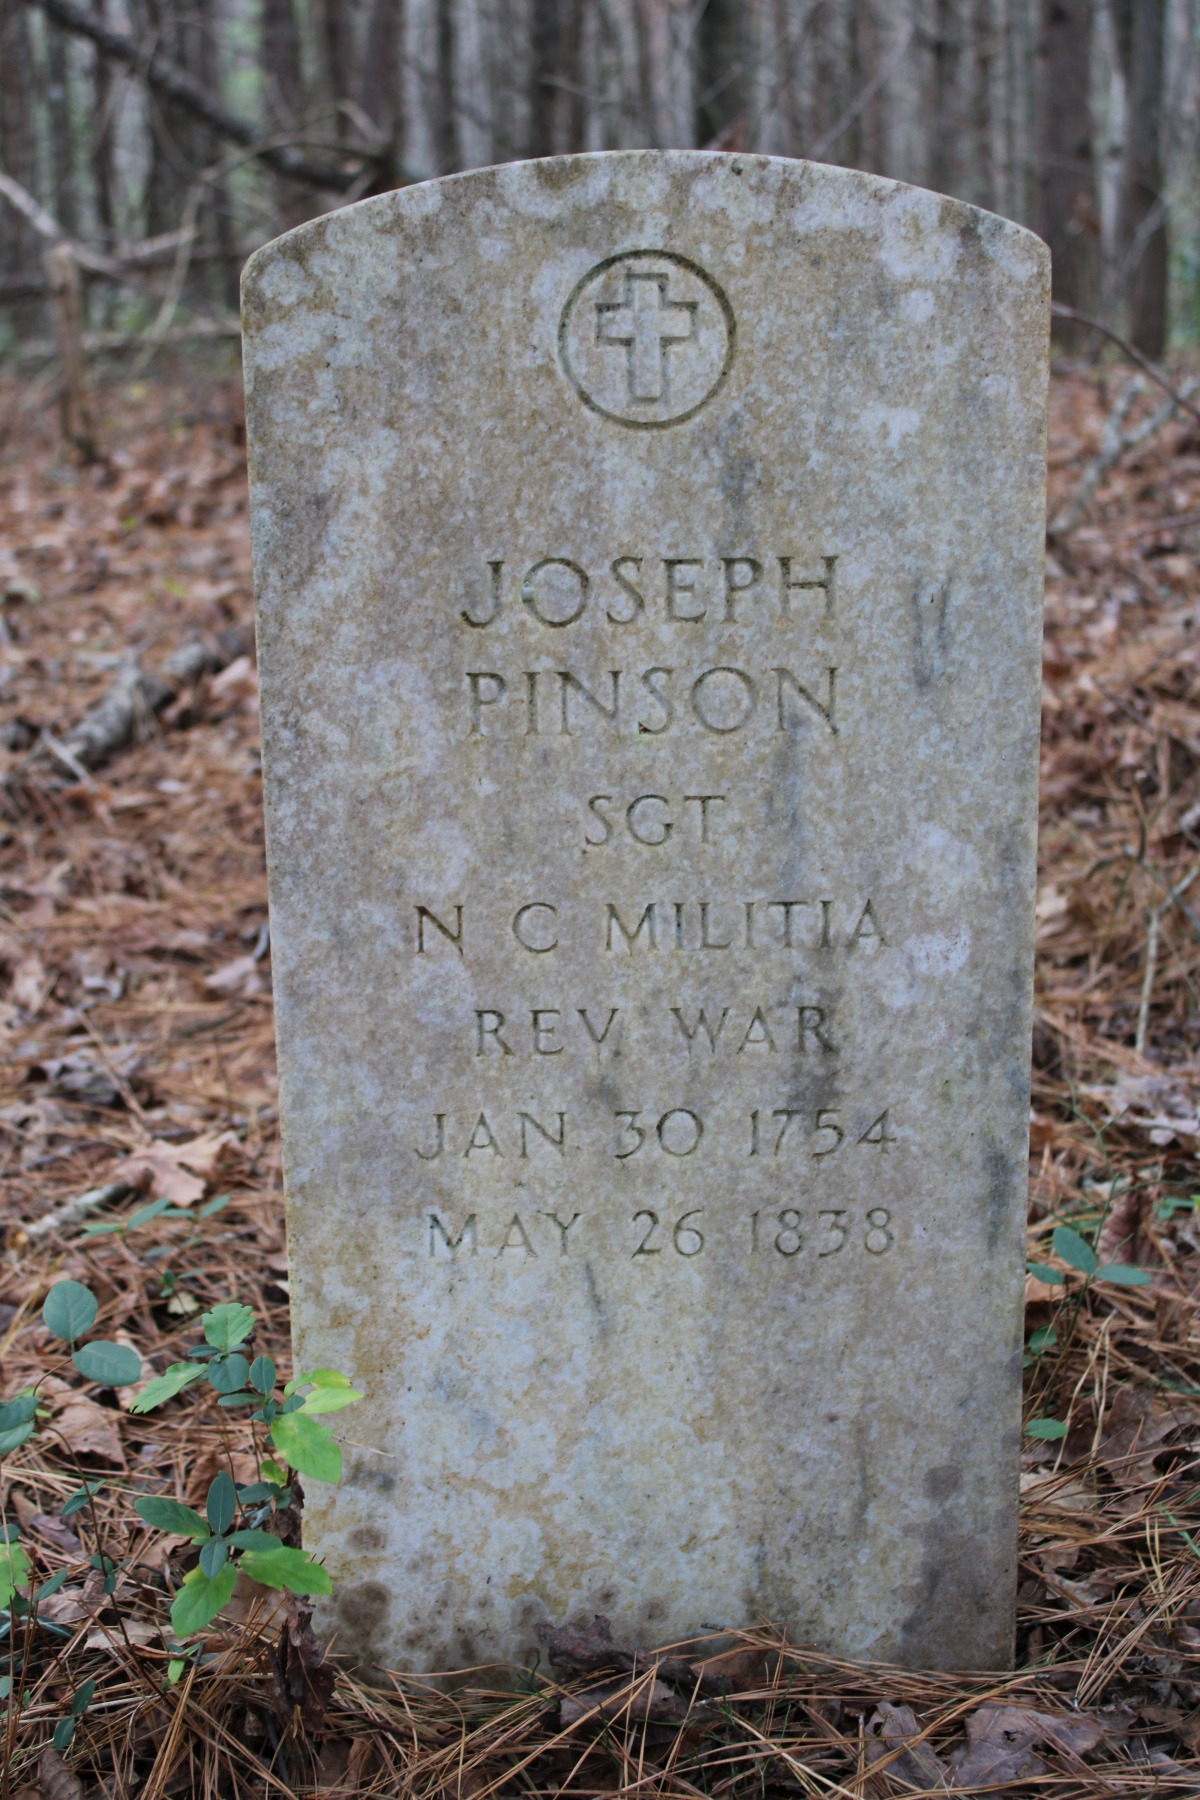 Joseph Pinson headstone